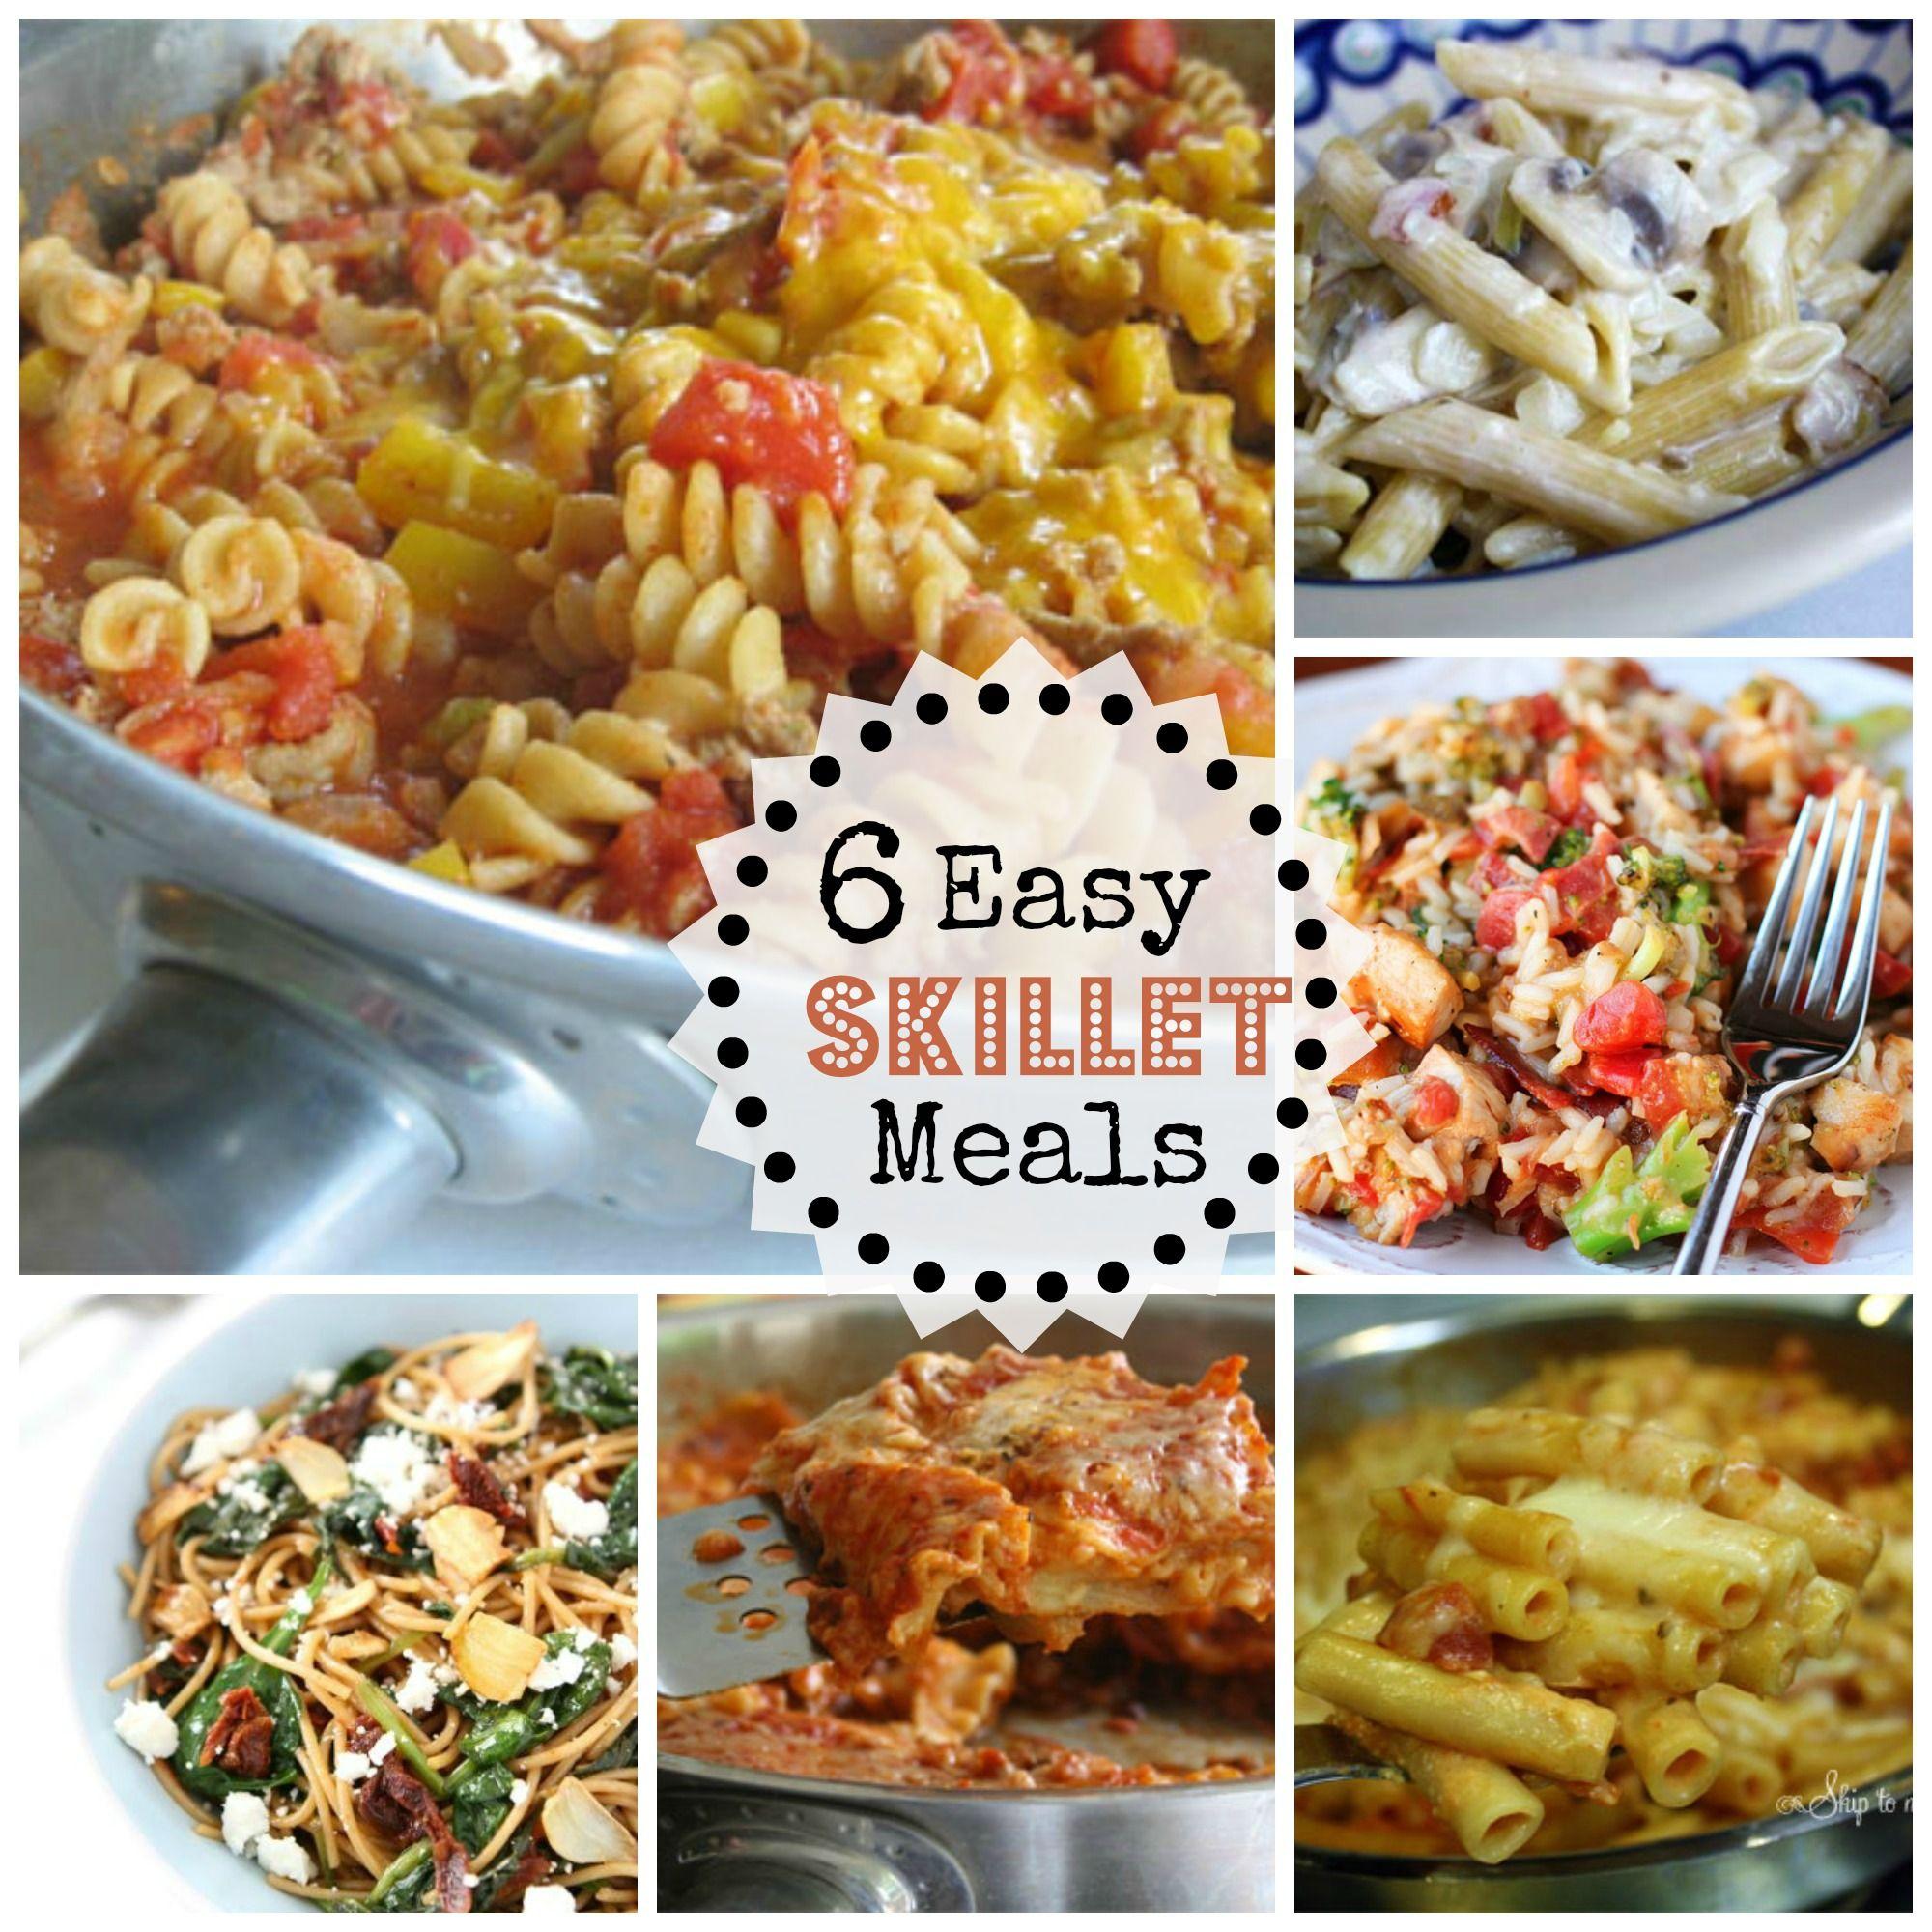 6 easy skillet dinners dinner recipes pinterest skillet meals